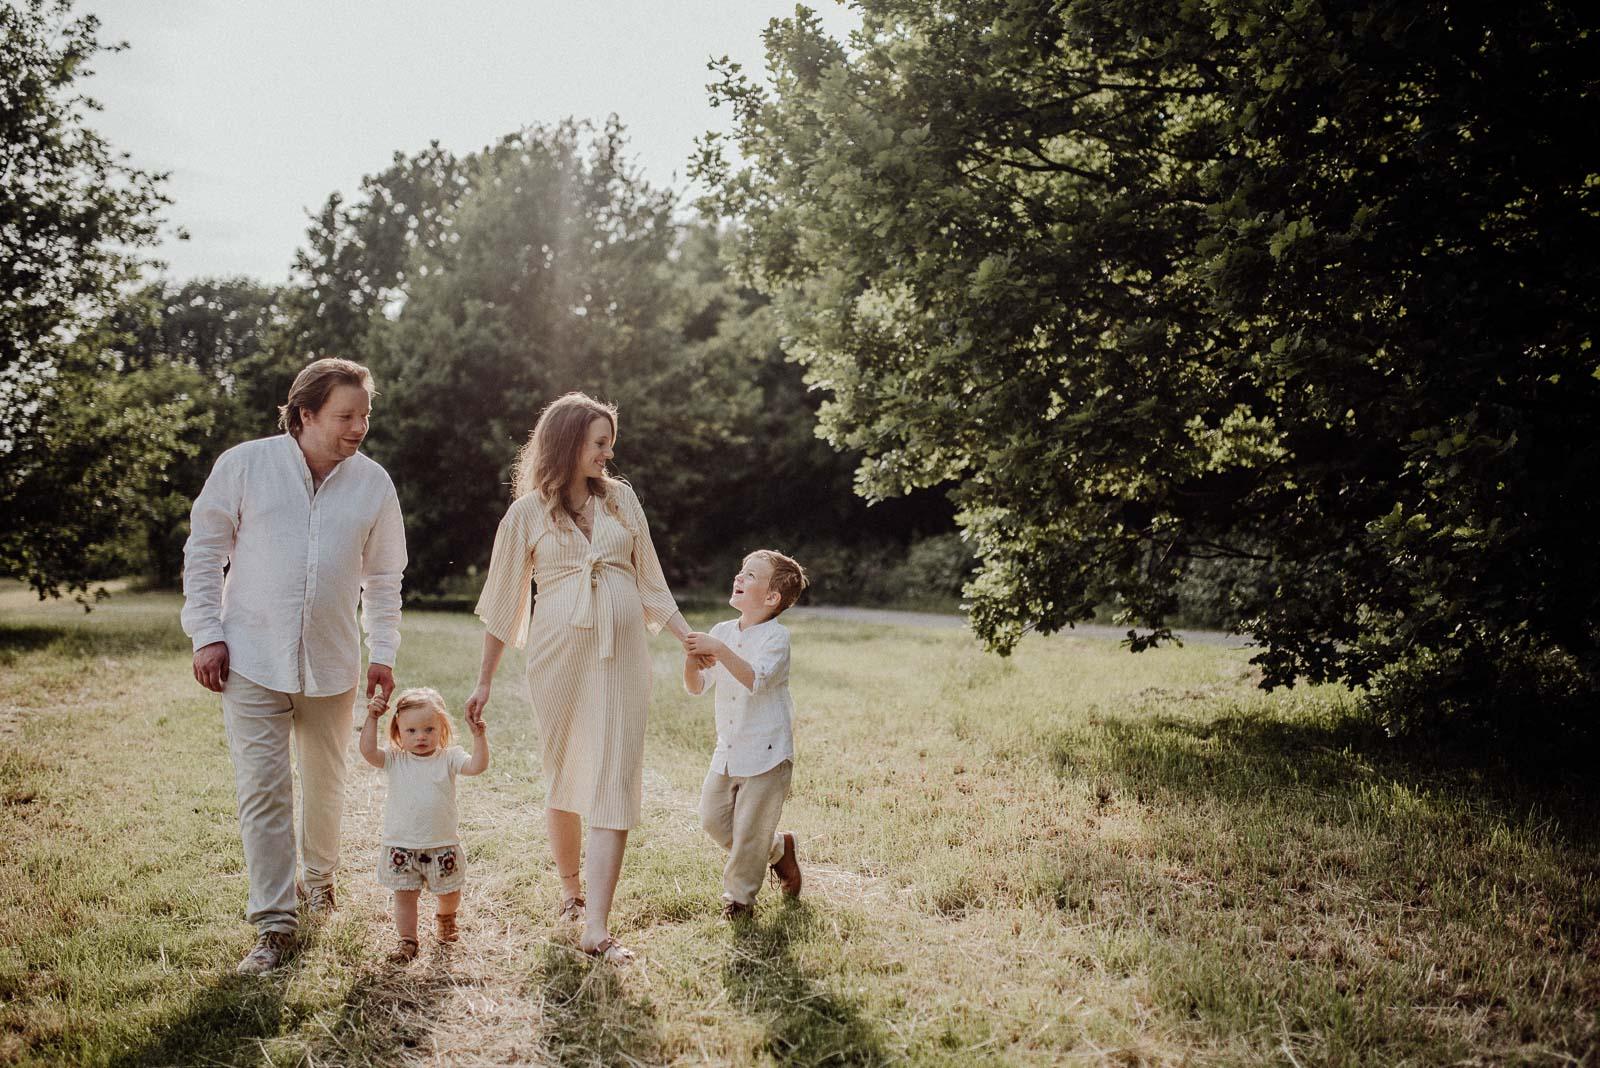 015-familien-fotoshooting-herne-heide